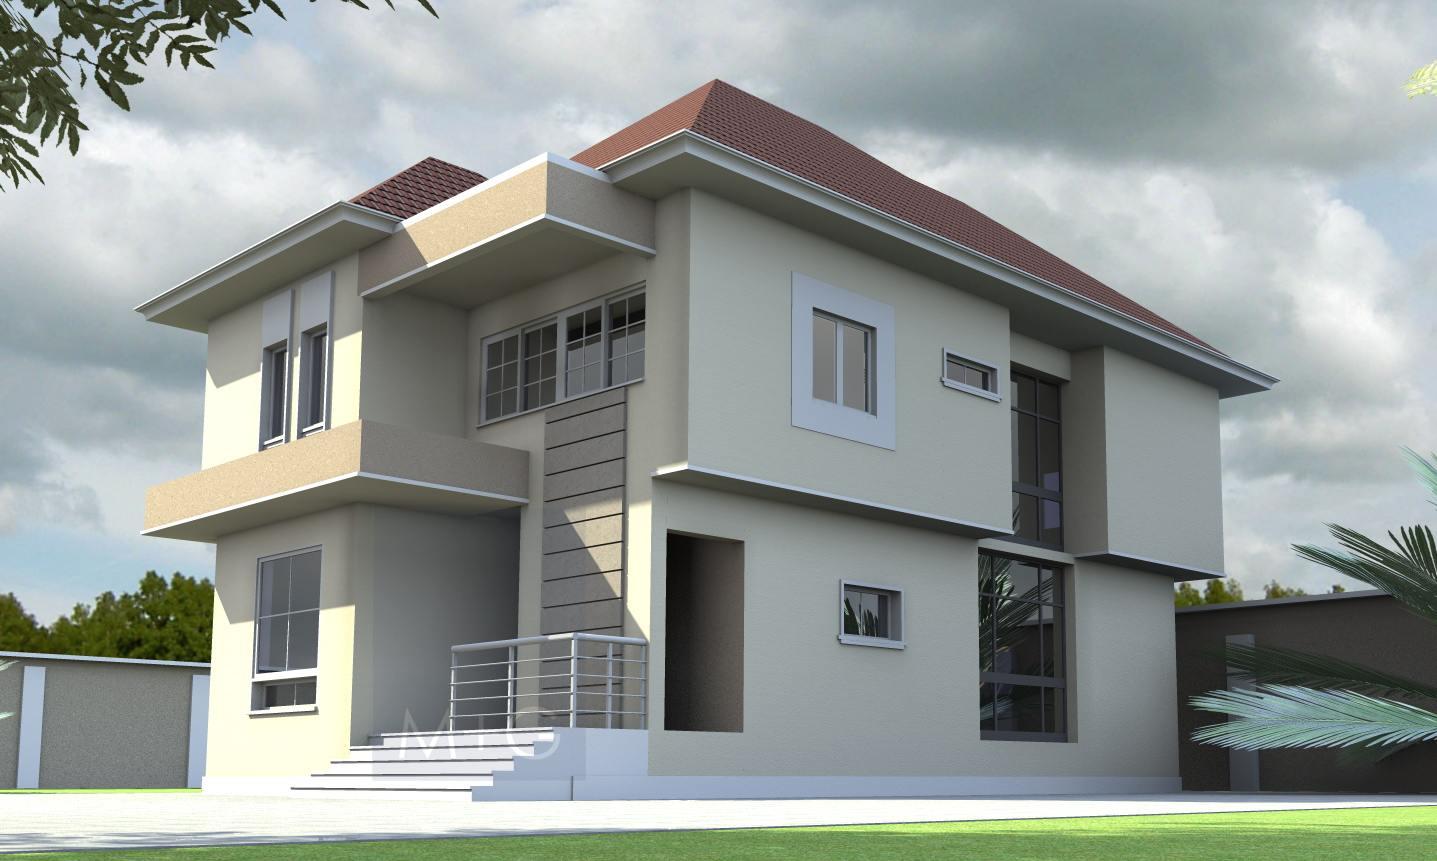 Best design houses in nigeria